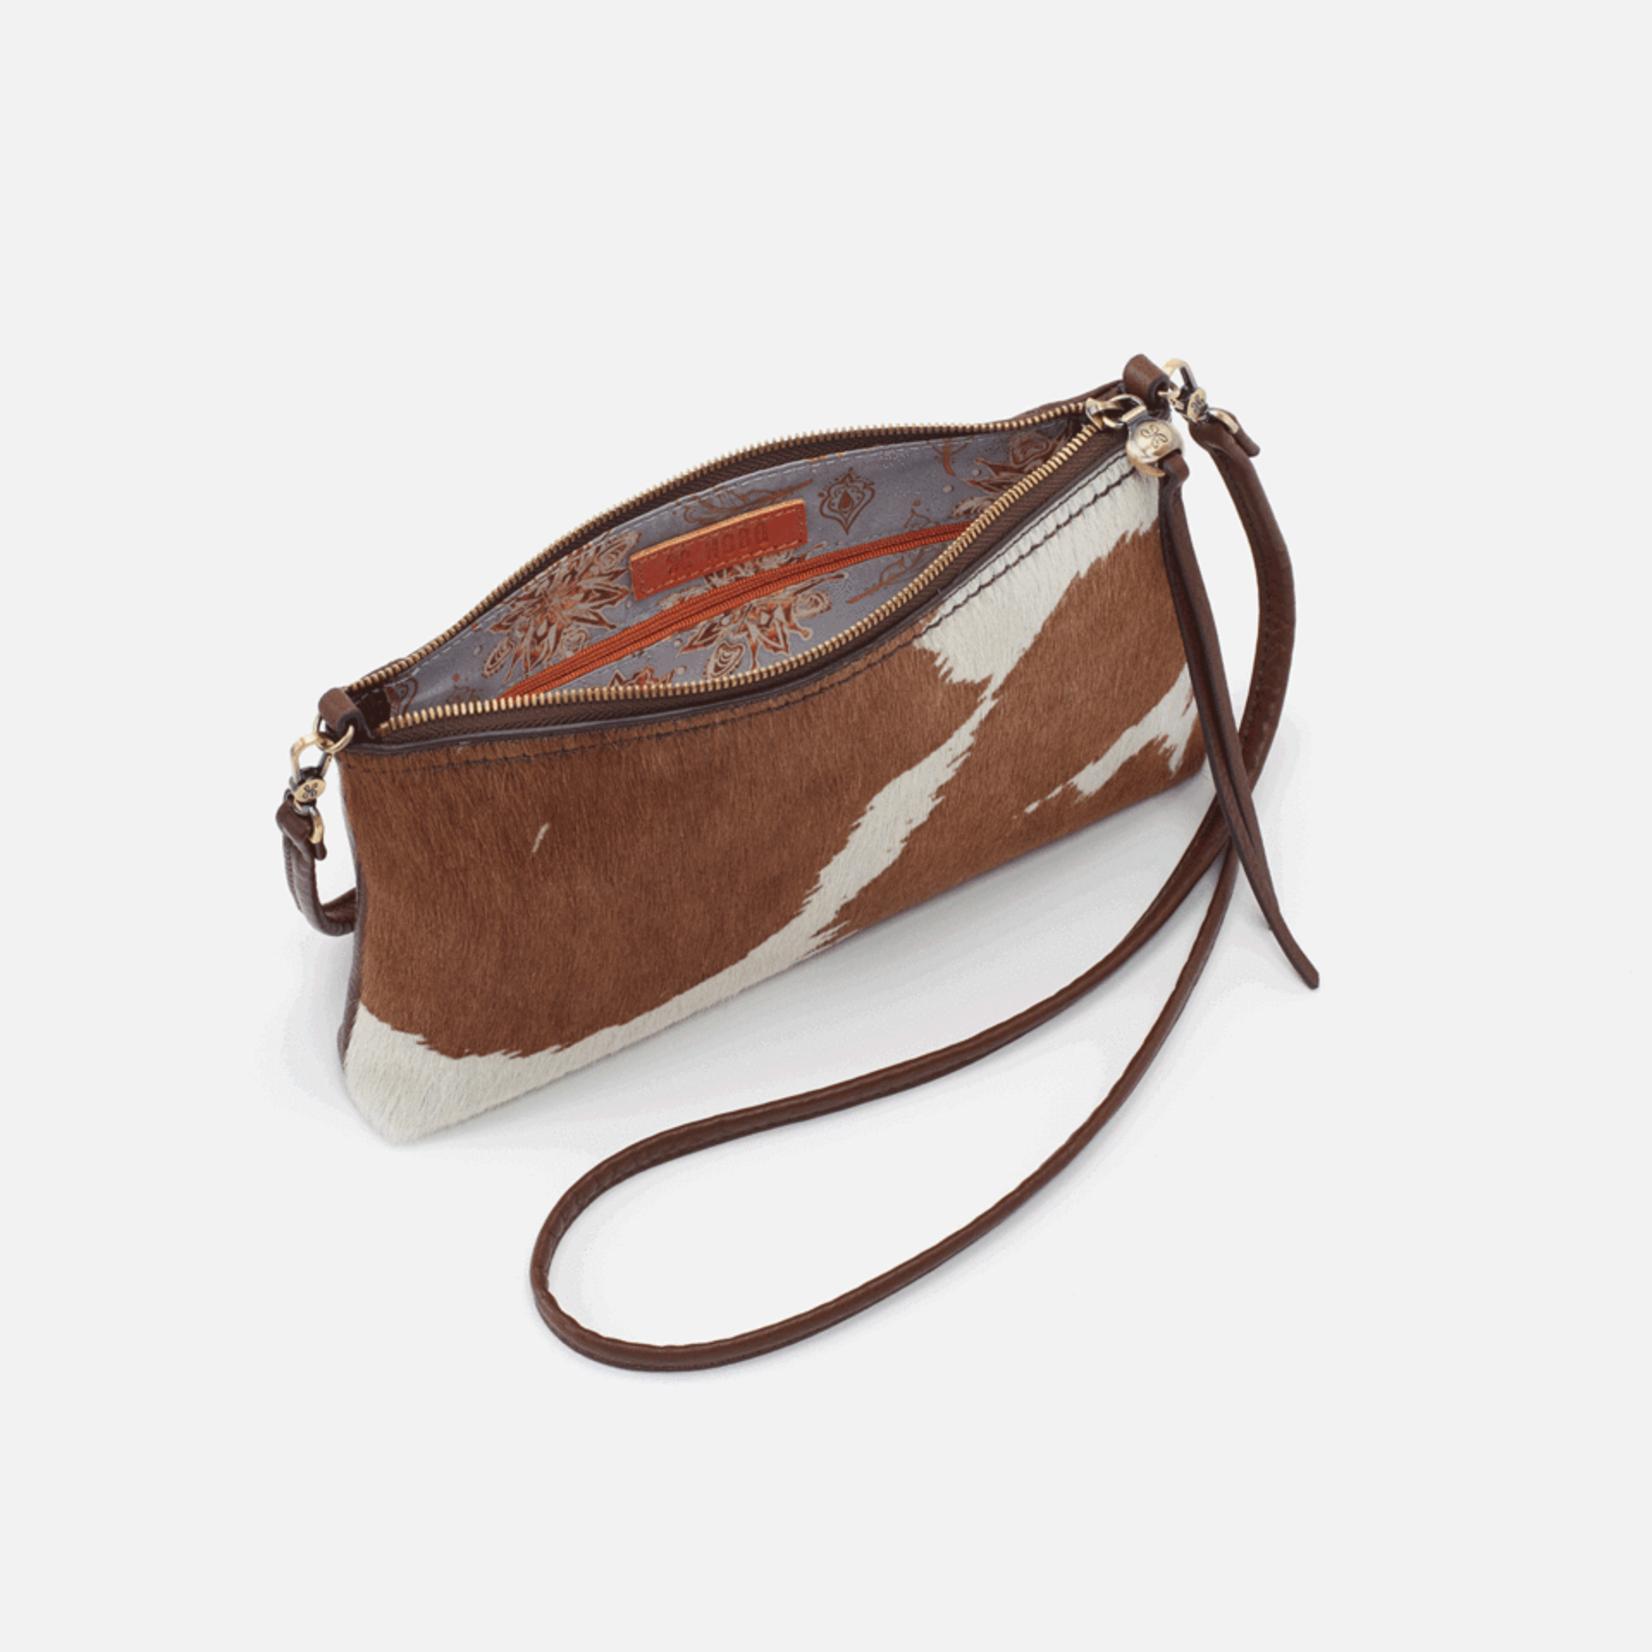 HOBO Darcy Cow Print Leather Wristlet/Crossbody